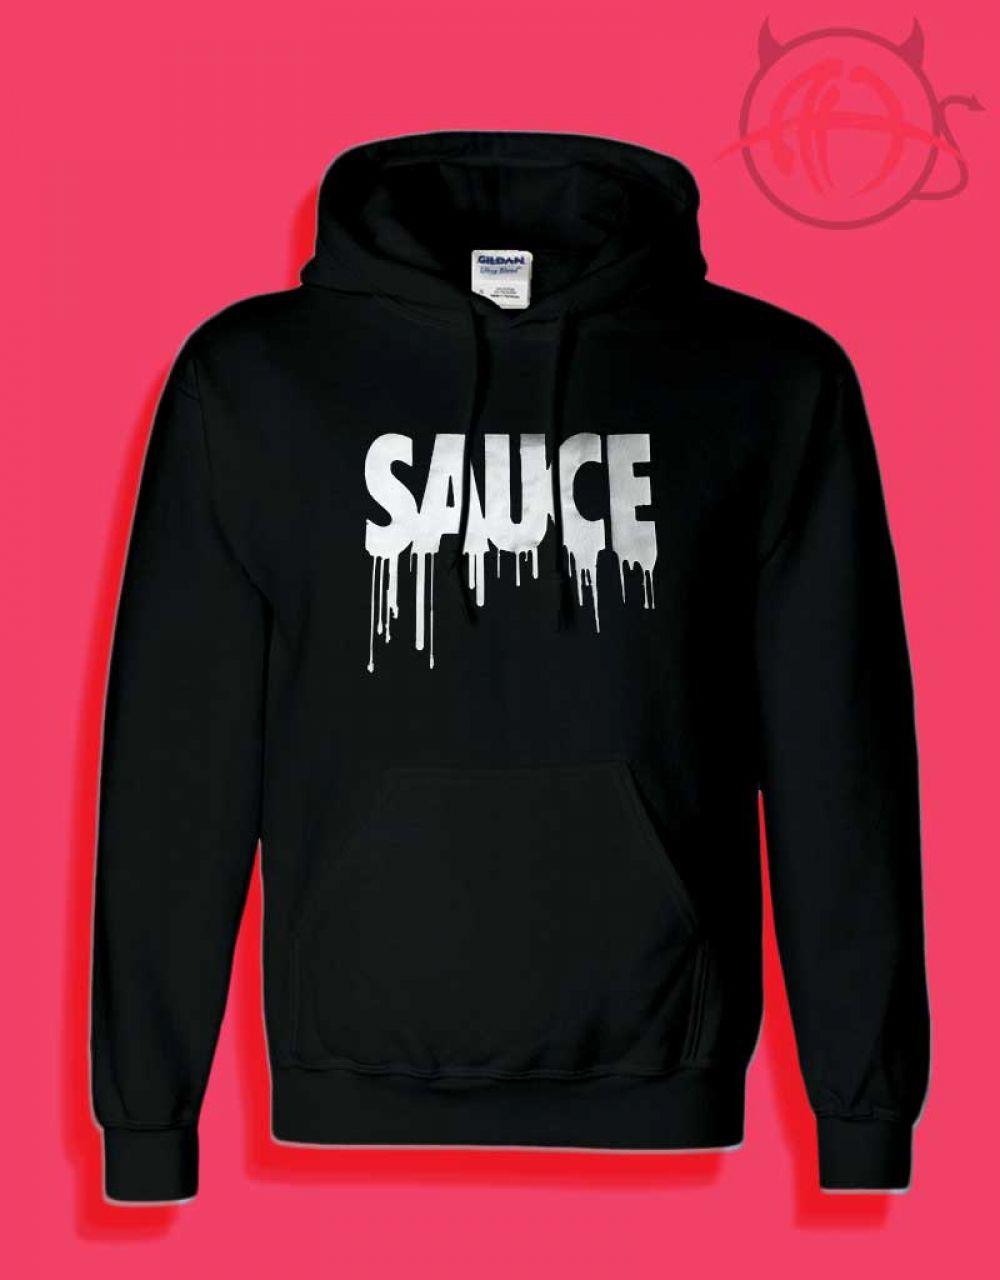 17620c5508 Cheap Custom Sauce Hoodies   33.50  Tee  Hype  Outfits  Outfit  Hypebeast   fashion  shirt  Tees  Tops  Teen